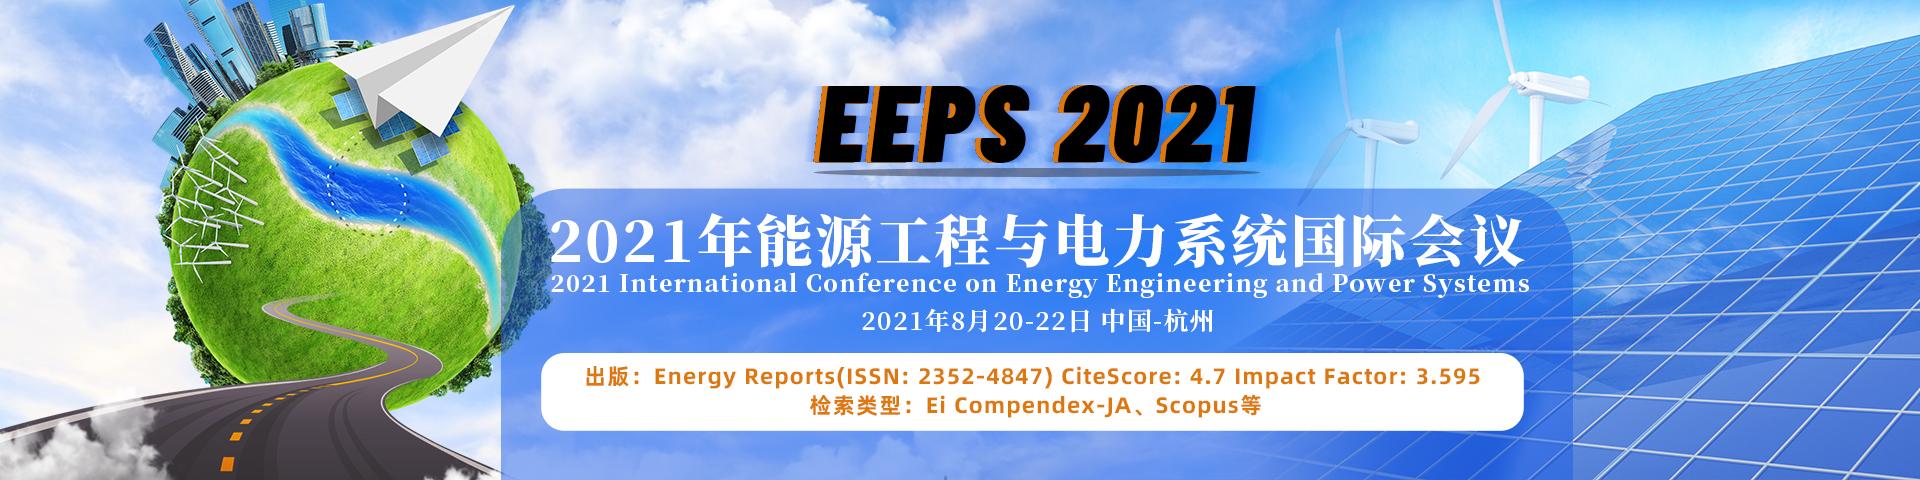 8月杭州EEPS2021-艾思-何霞丽-202111.jpg